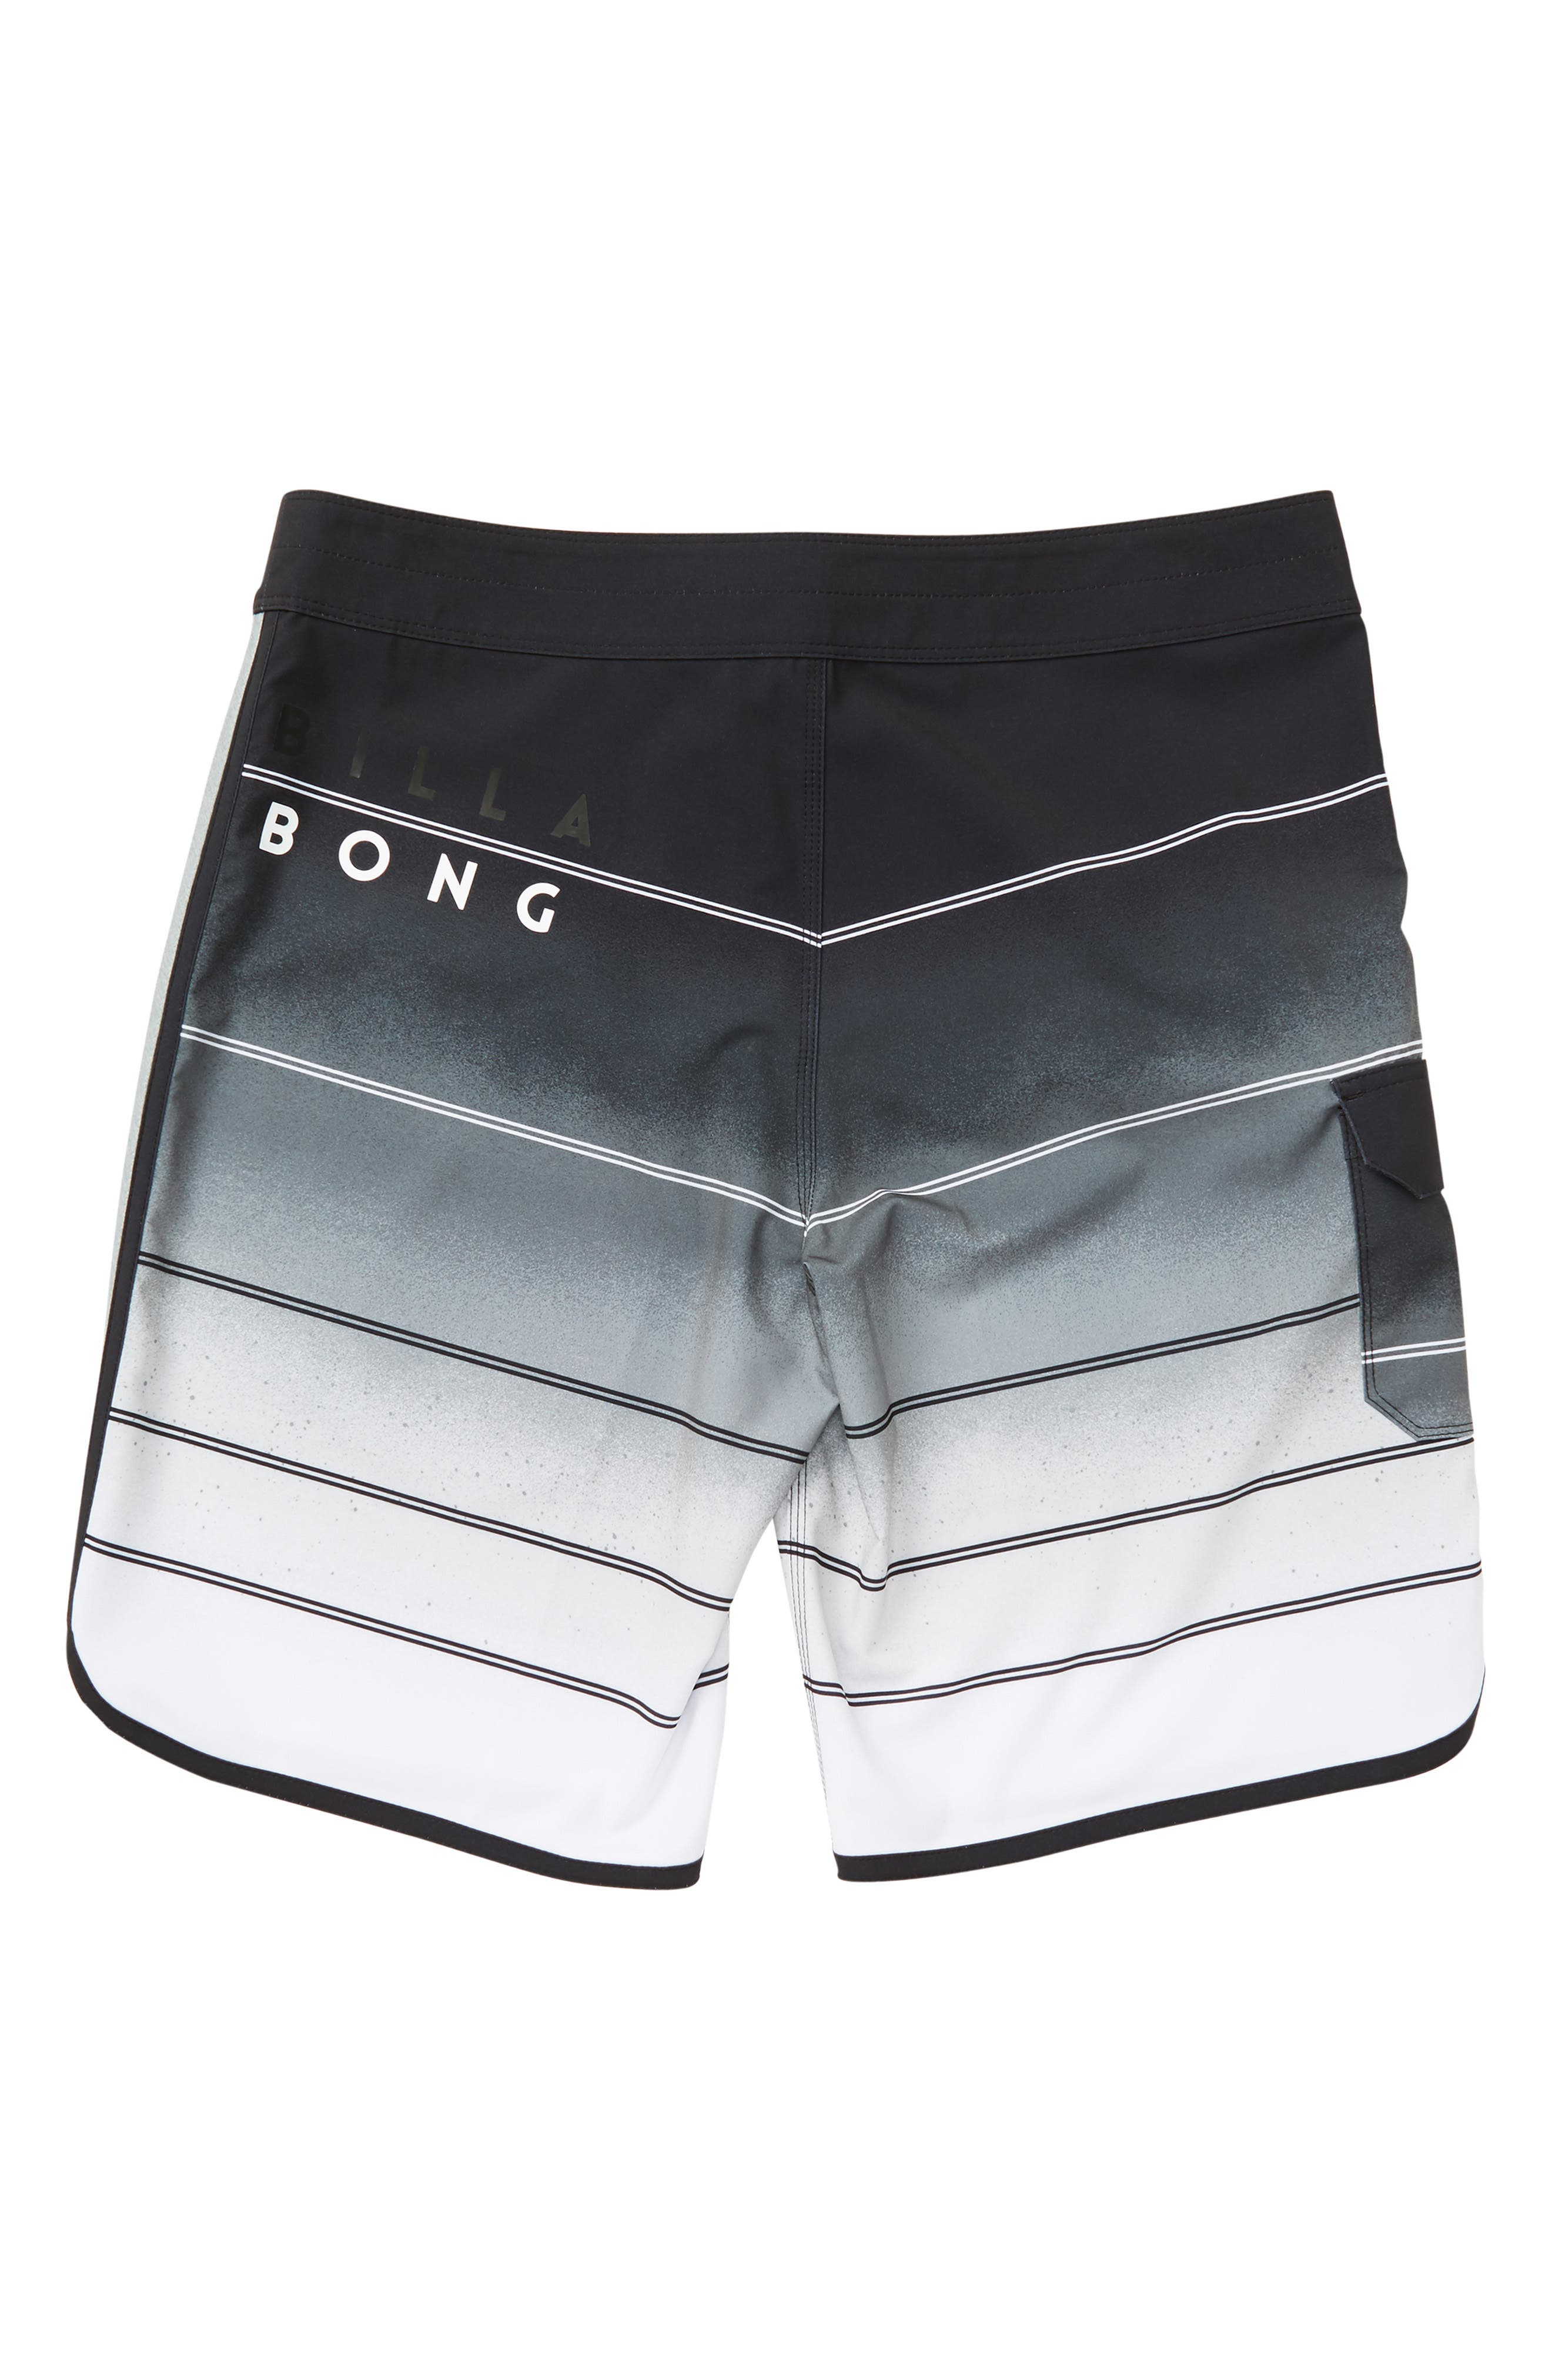 73 X Stripe Board Shorts,                             Alternate thumbnail 2, color,                             020